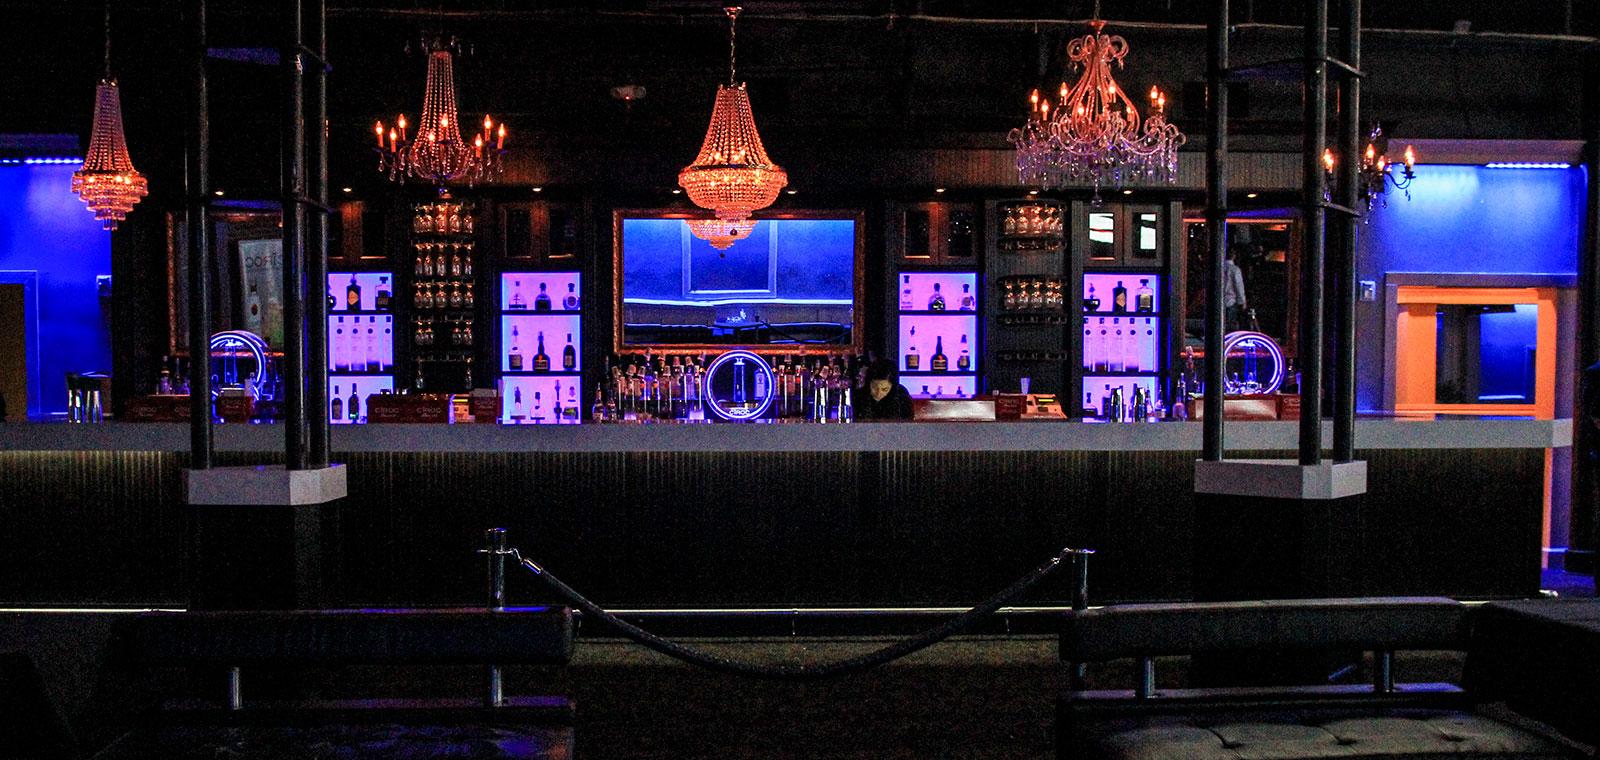 metro-neworleans-night-club4